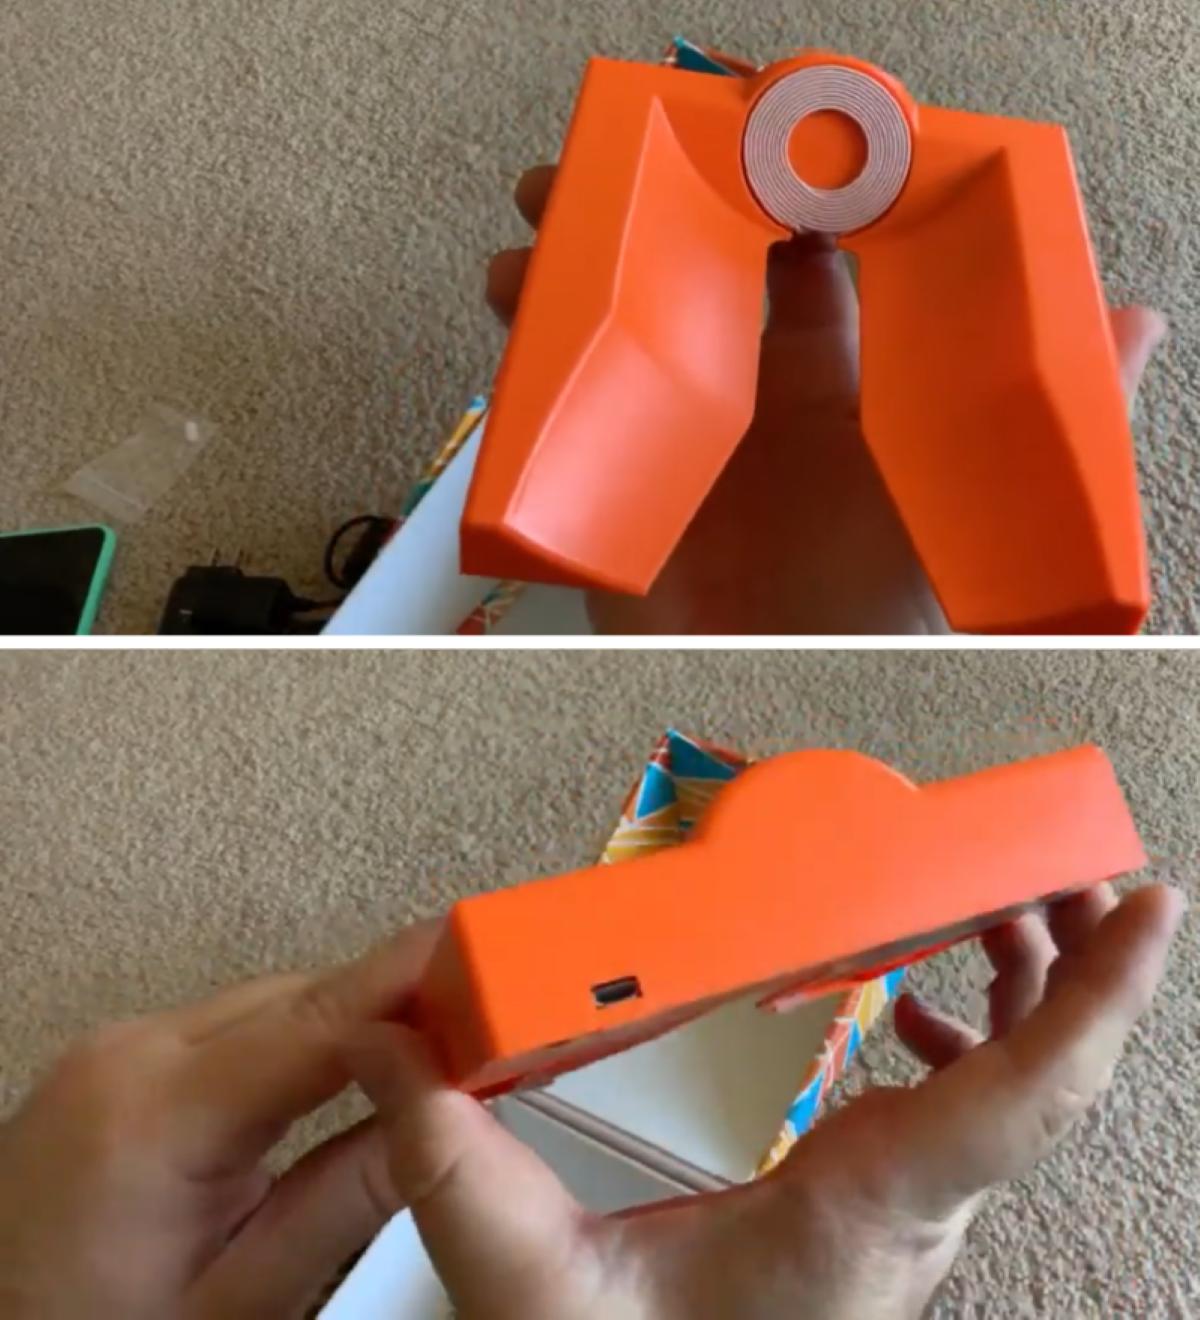 Playdate - Wireless Charging Dock (1)